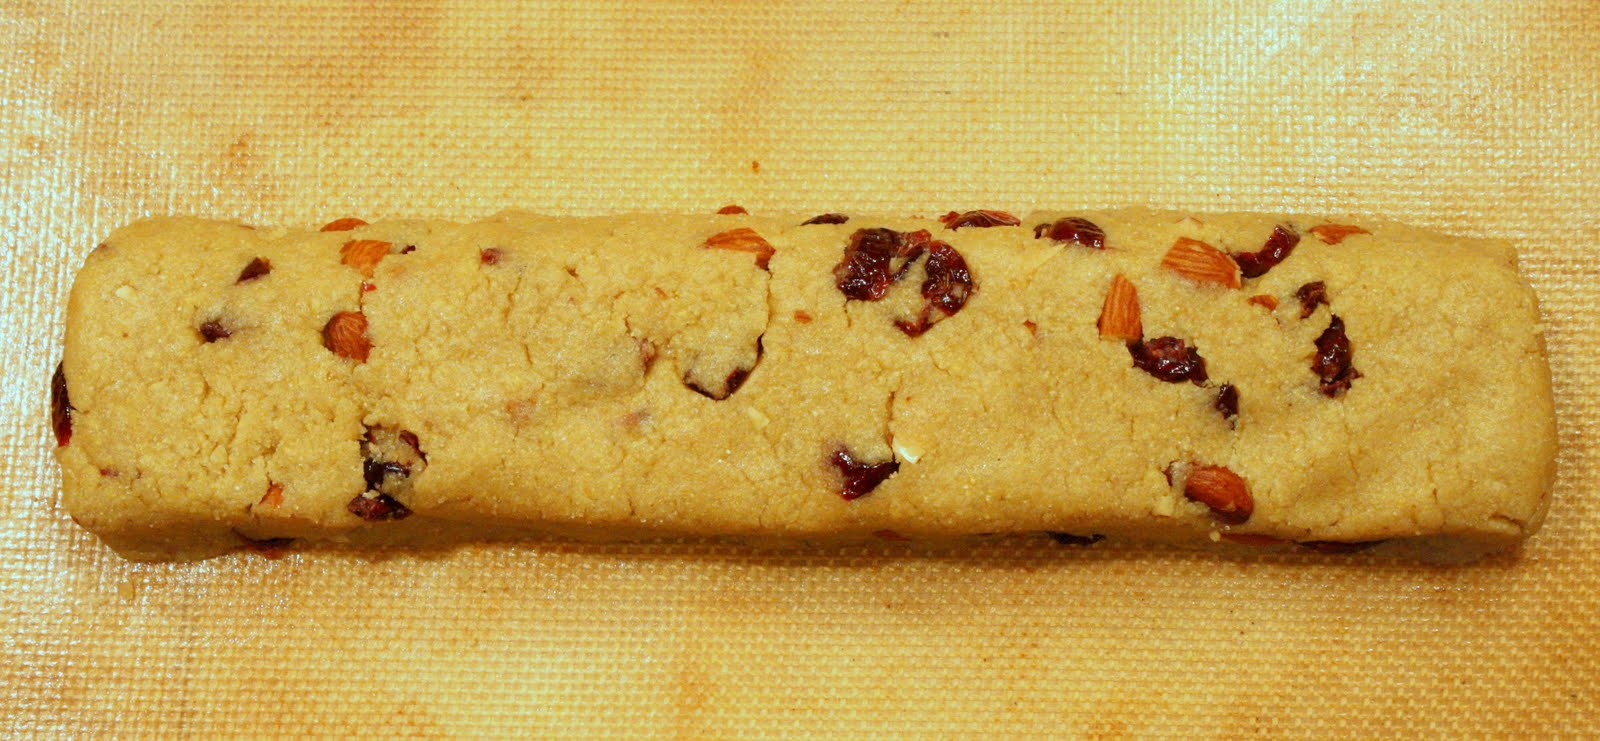 how to turn quinoa into flour